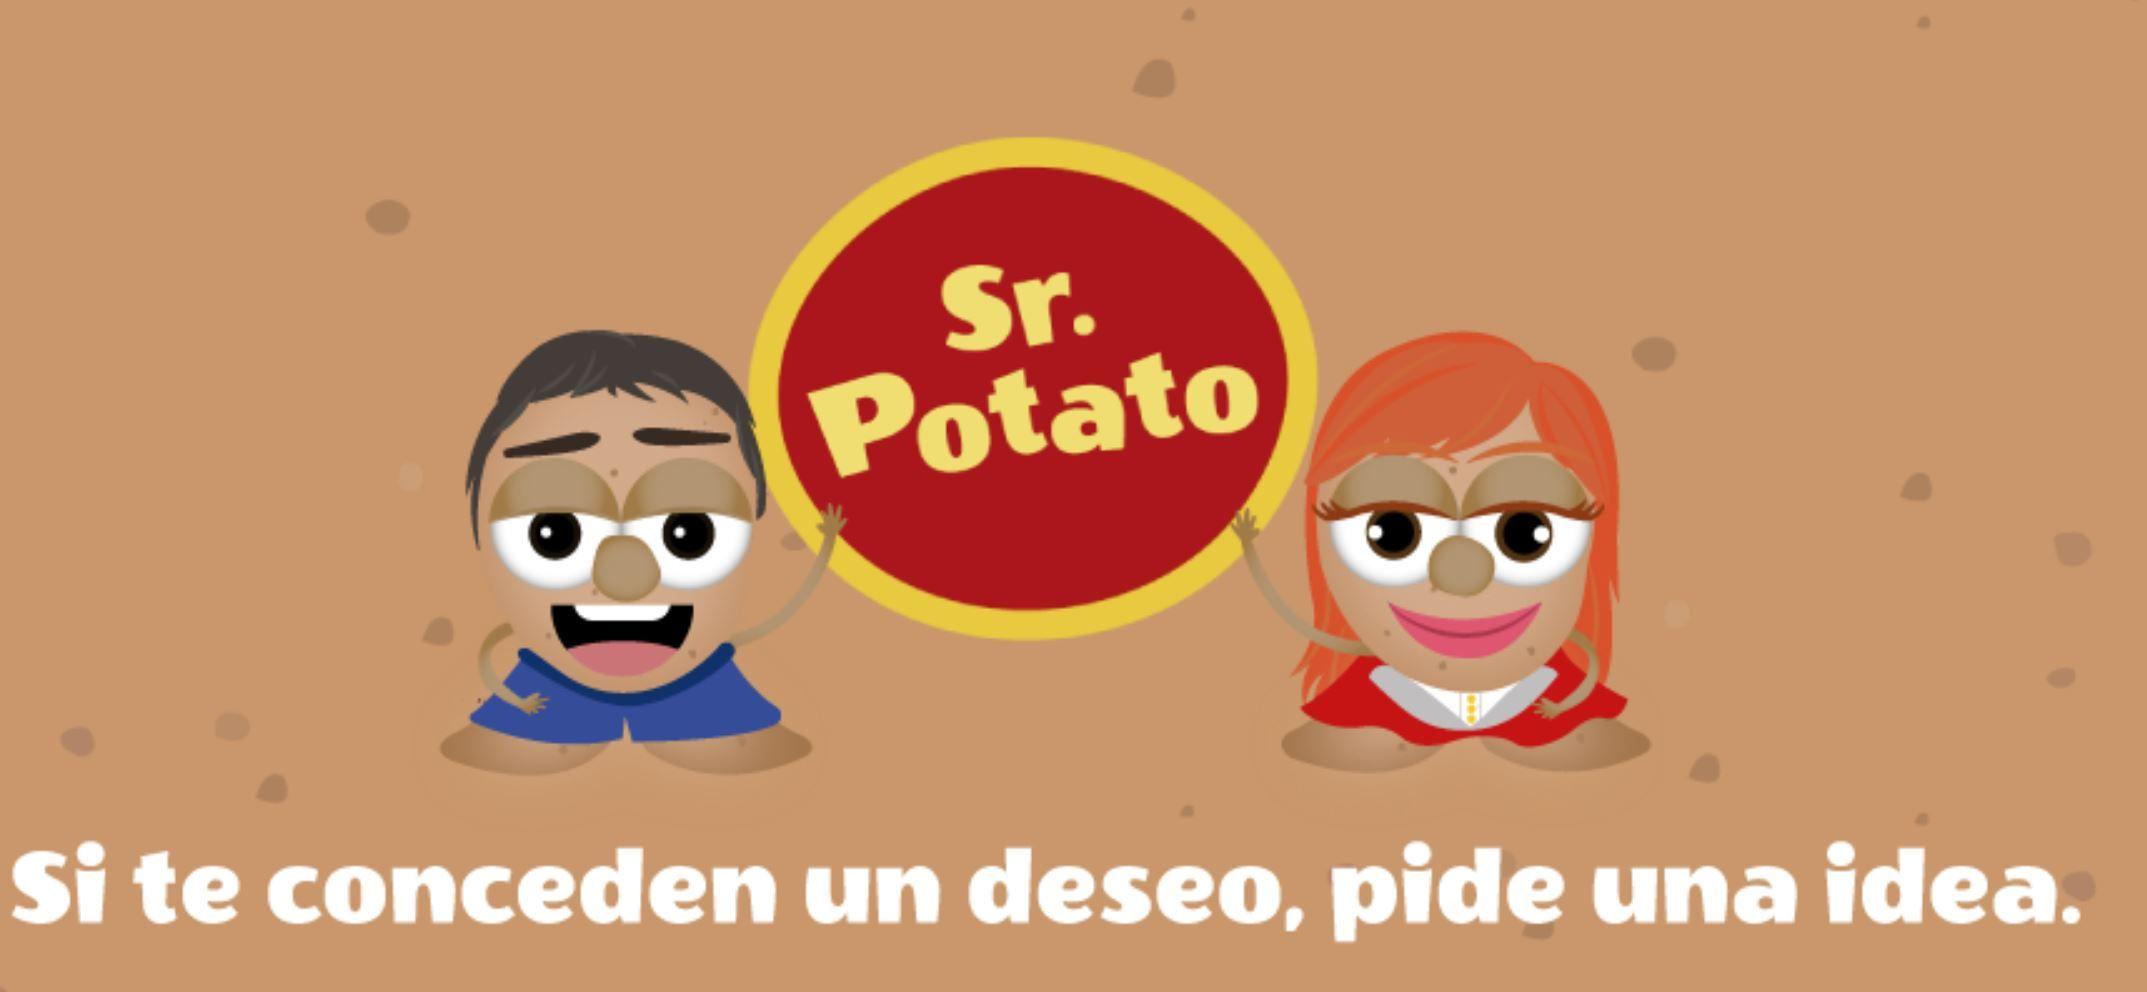 Foto de Sr. Potato Agencia de marketing digital de Madrid